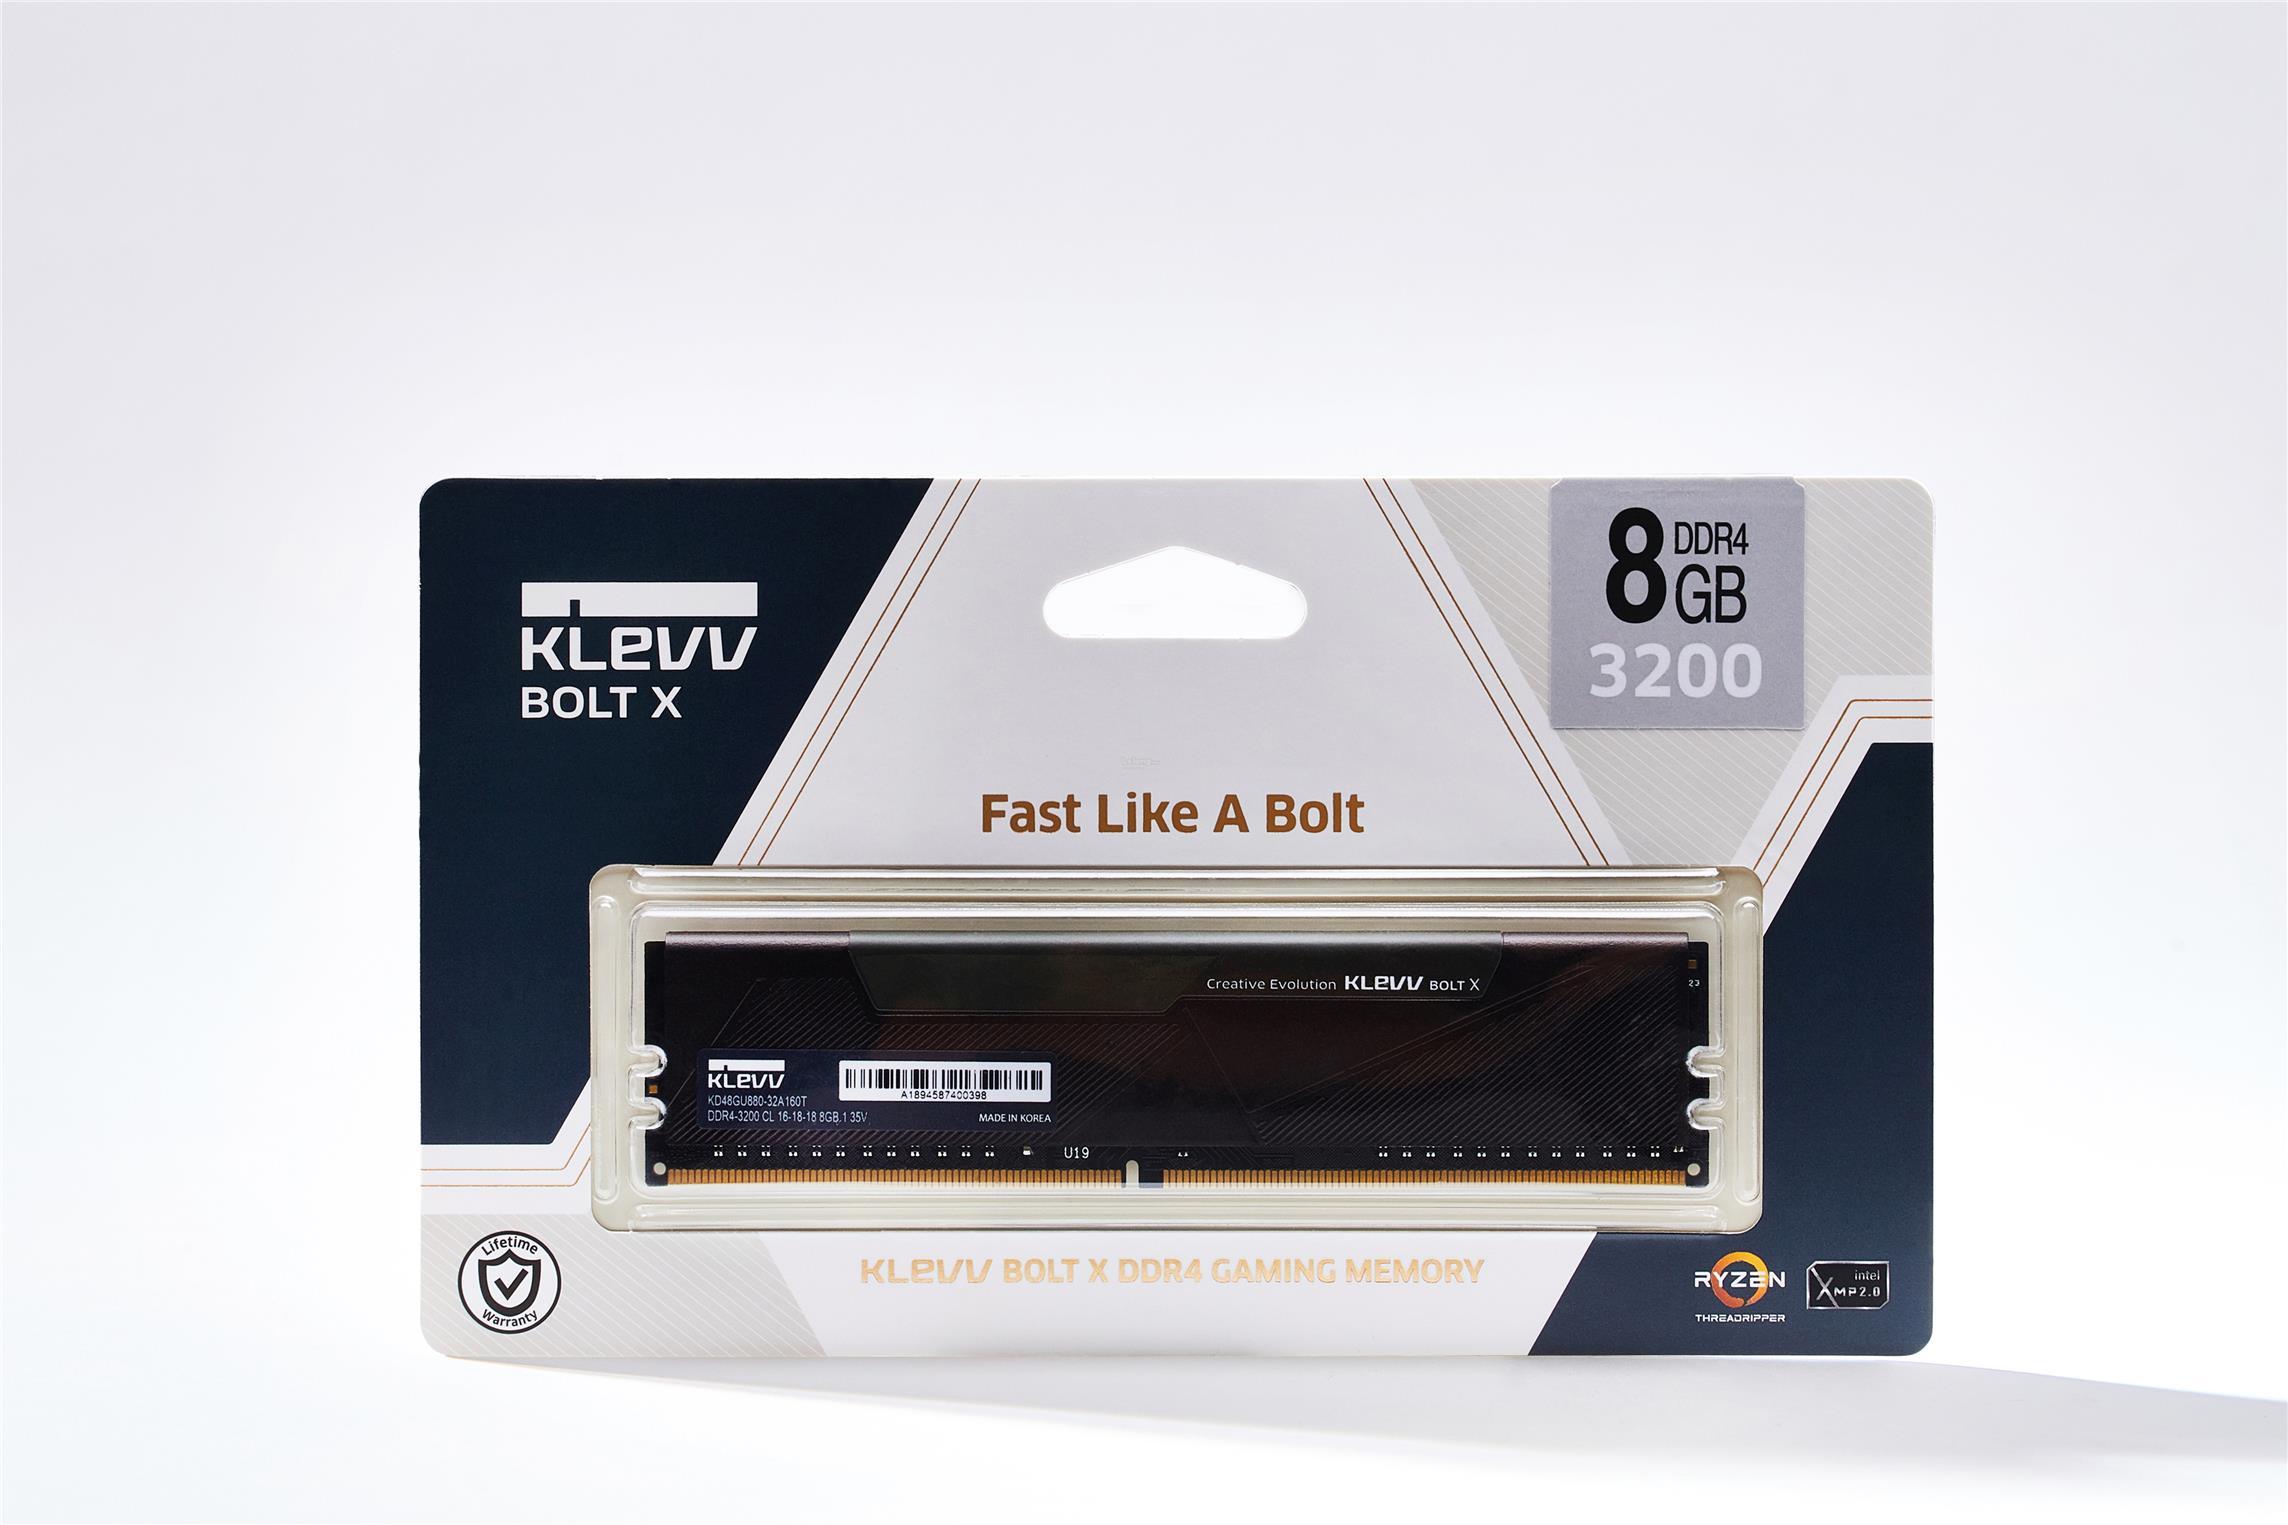 # KLEVV Bolt X 1x8GB DDR4 Gaming Memory # 2666MHz | 3200MHz